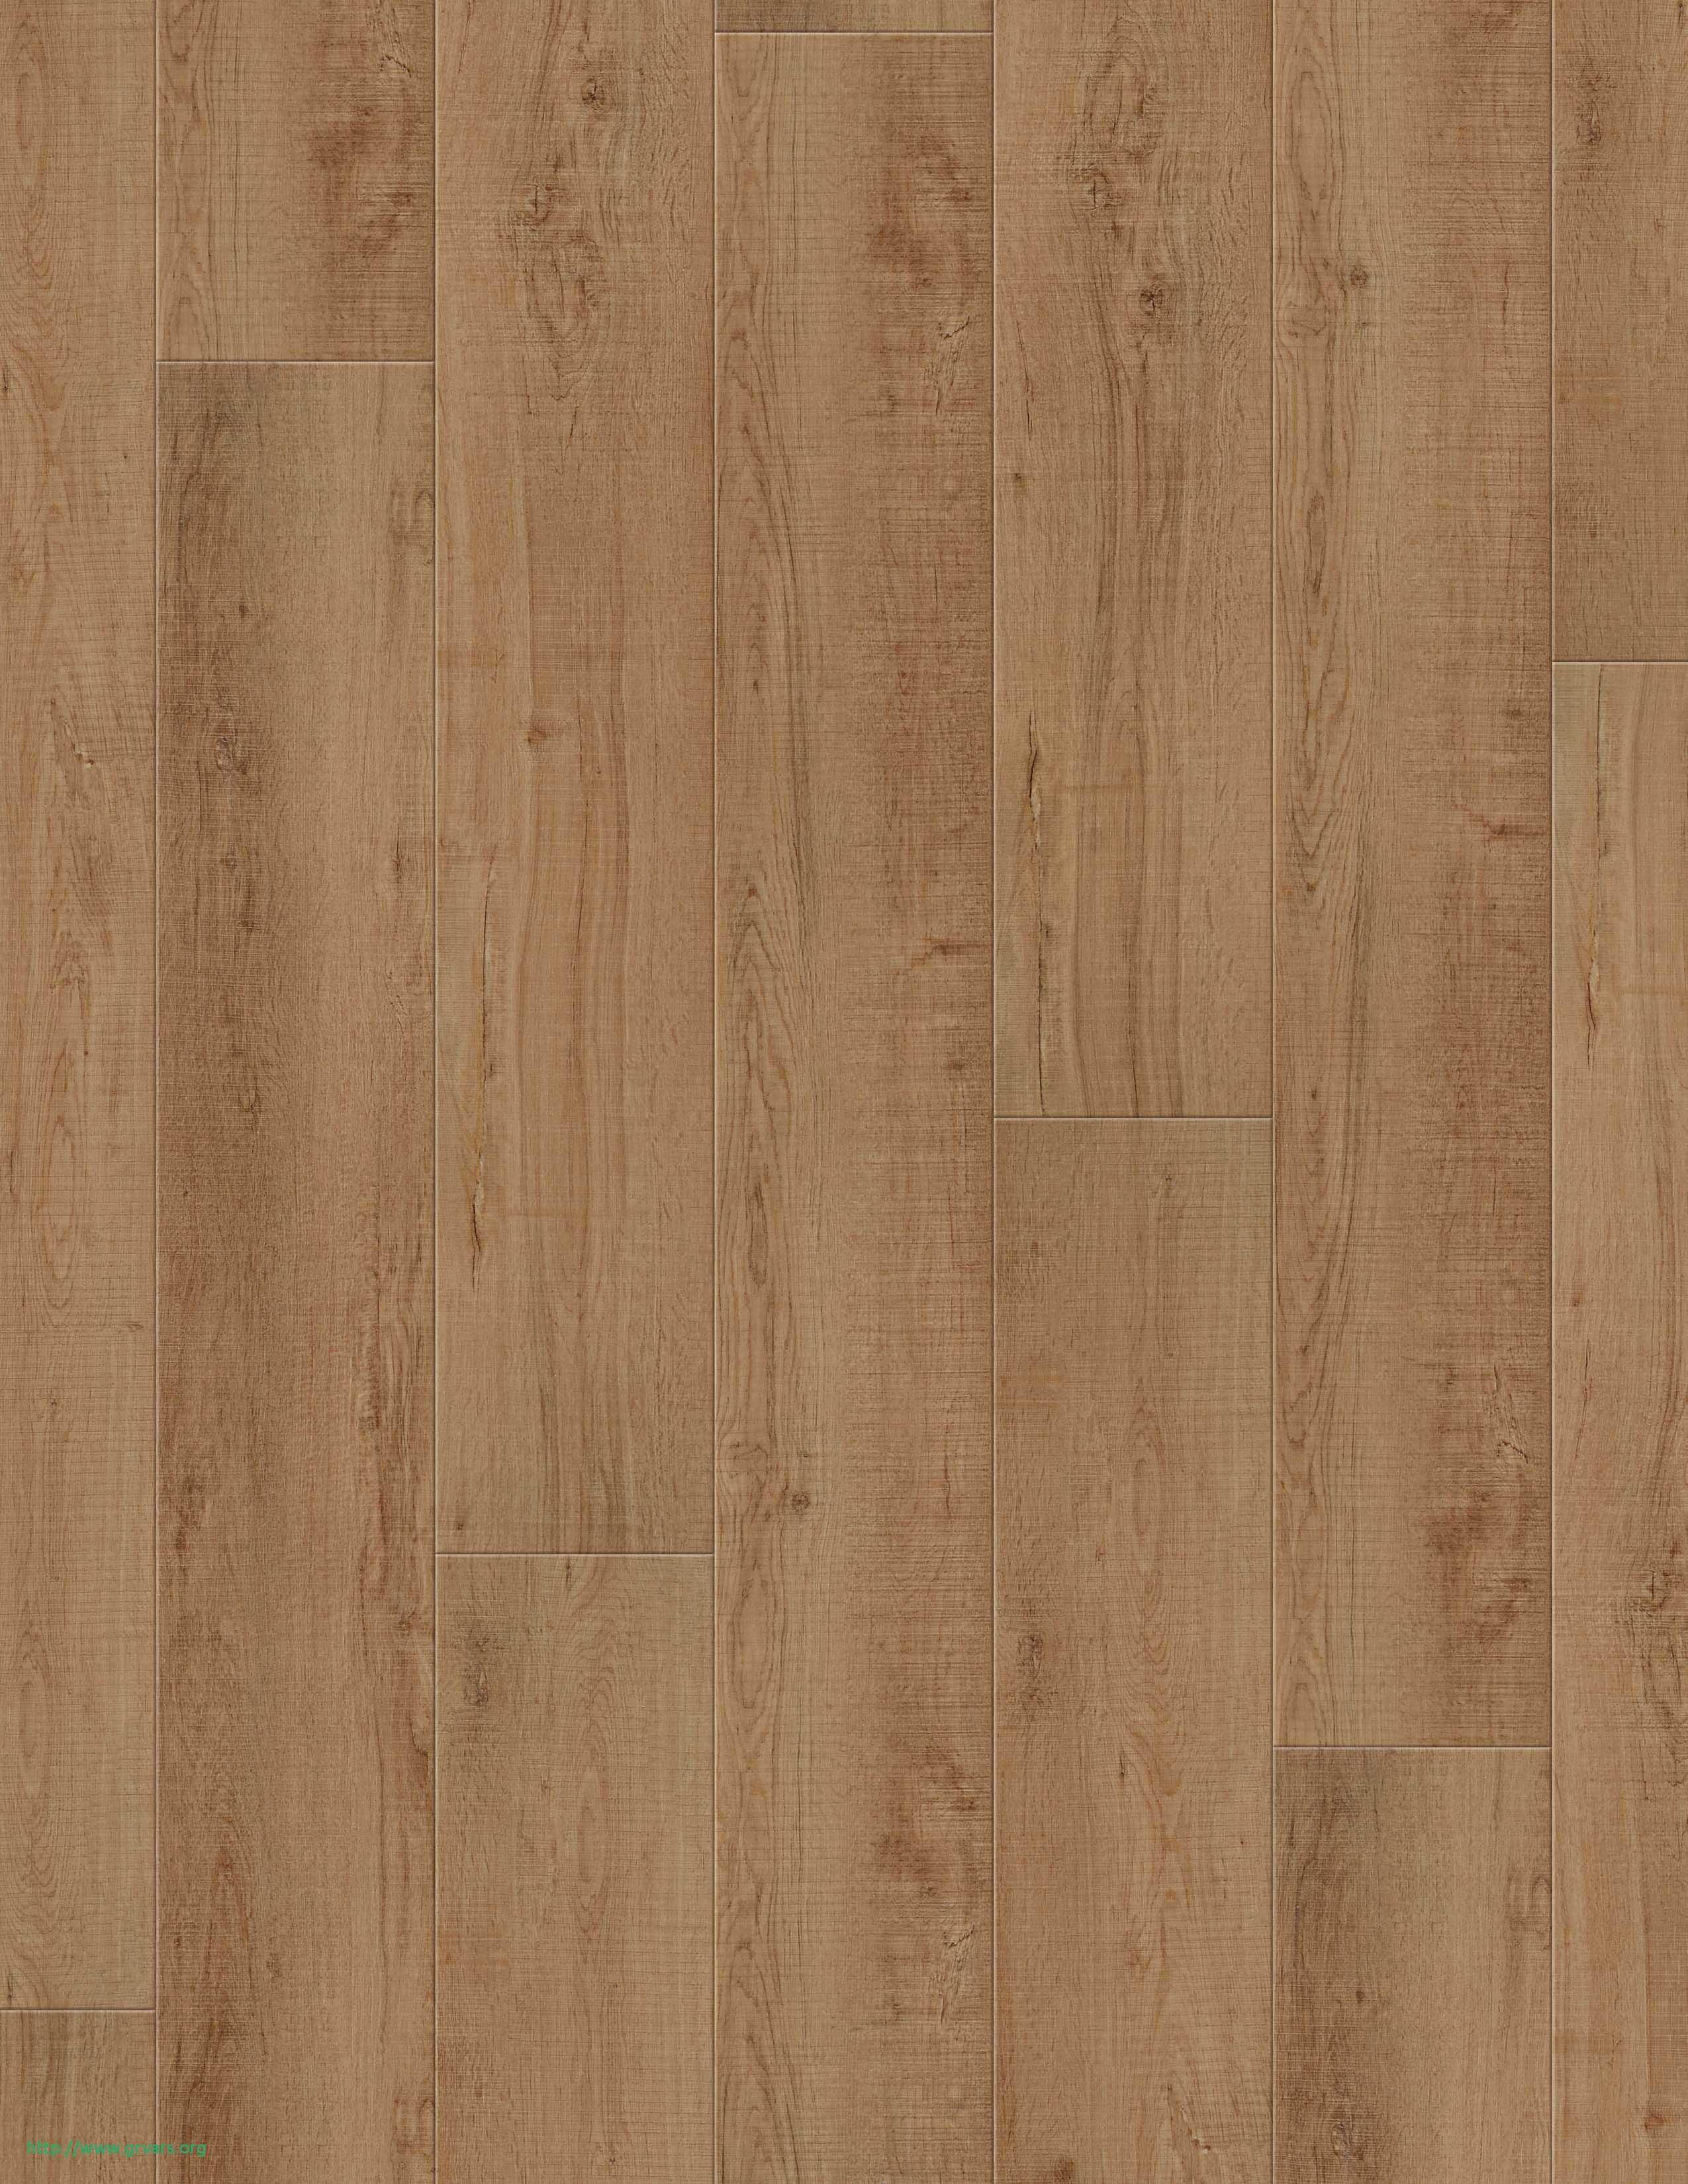 eureka hardwood floor vacuum of rustic river hardwood flooring reviews unique eureka springs maple with regard to rustic river hardwood flooring reviews a‰lagant waddington oak coretec plus xl enhanced pinterest